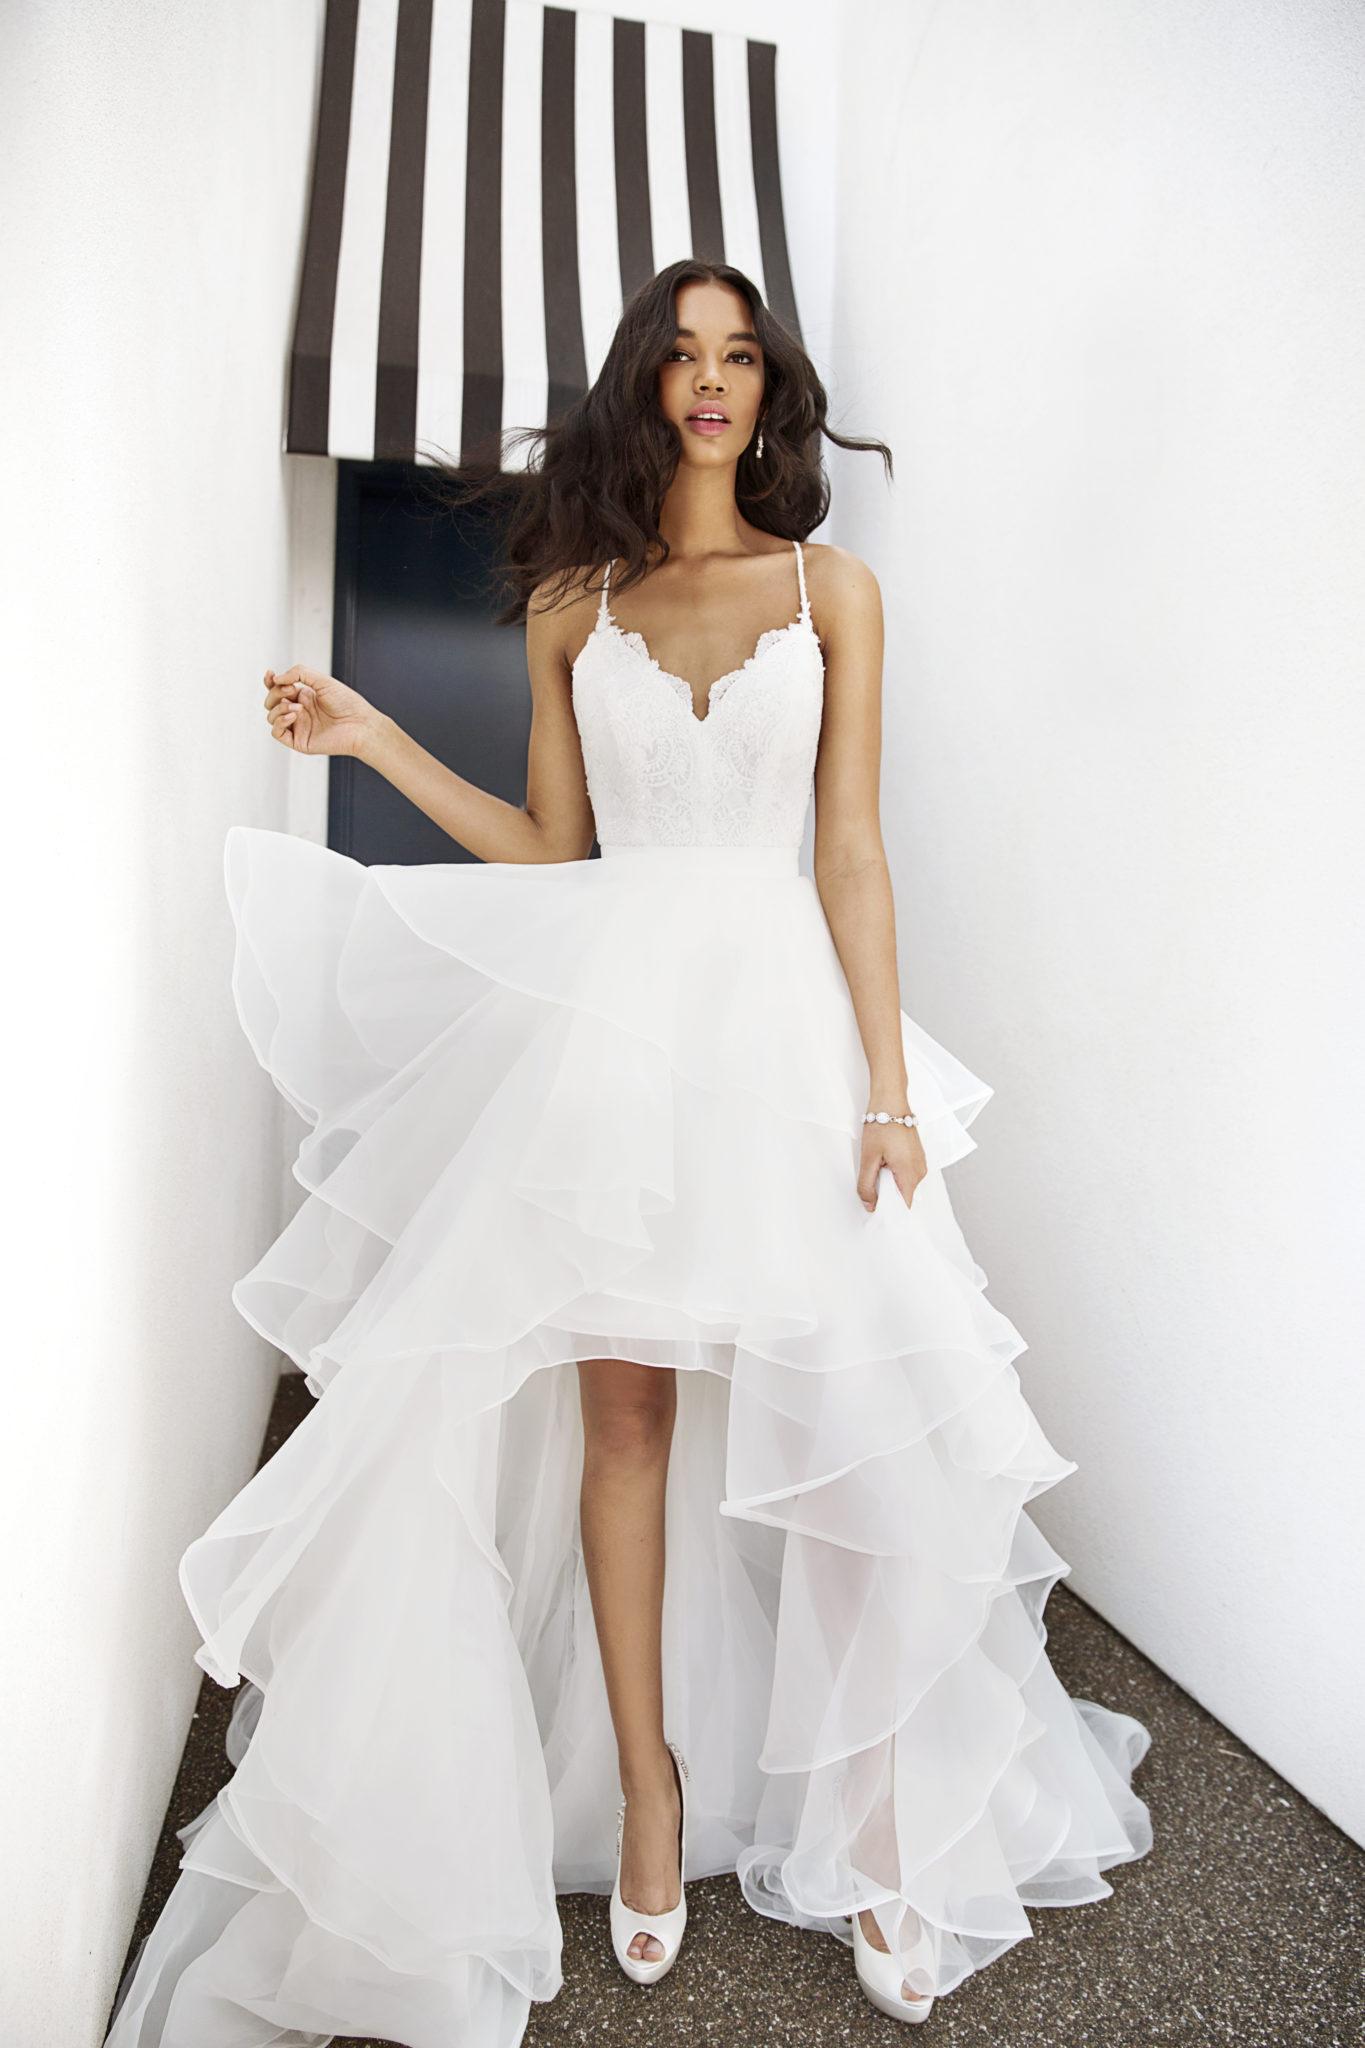 Sexy Wedding Dress from David's Bridal